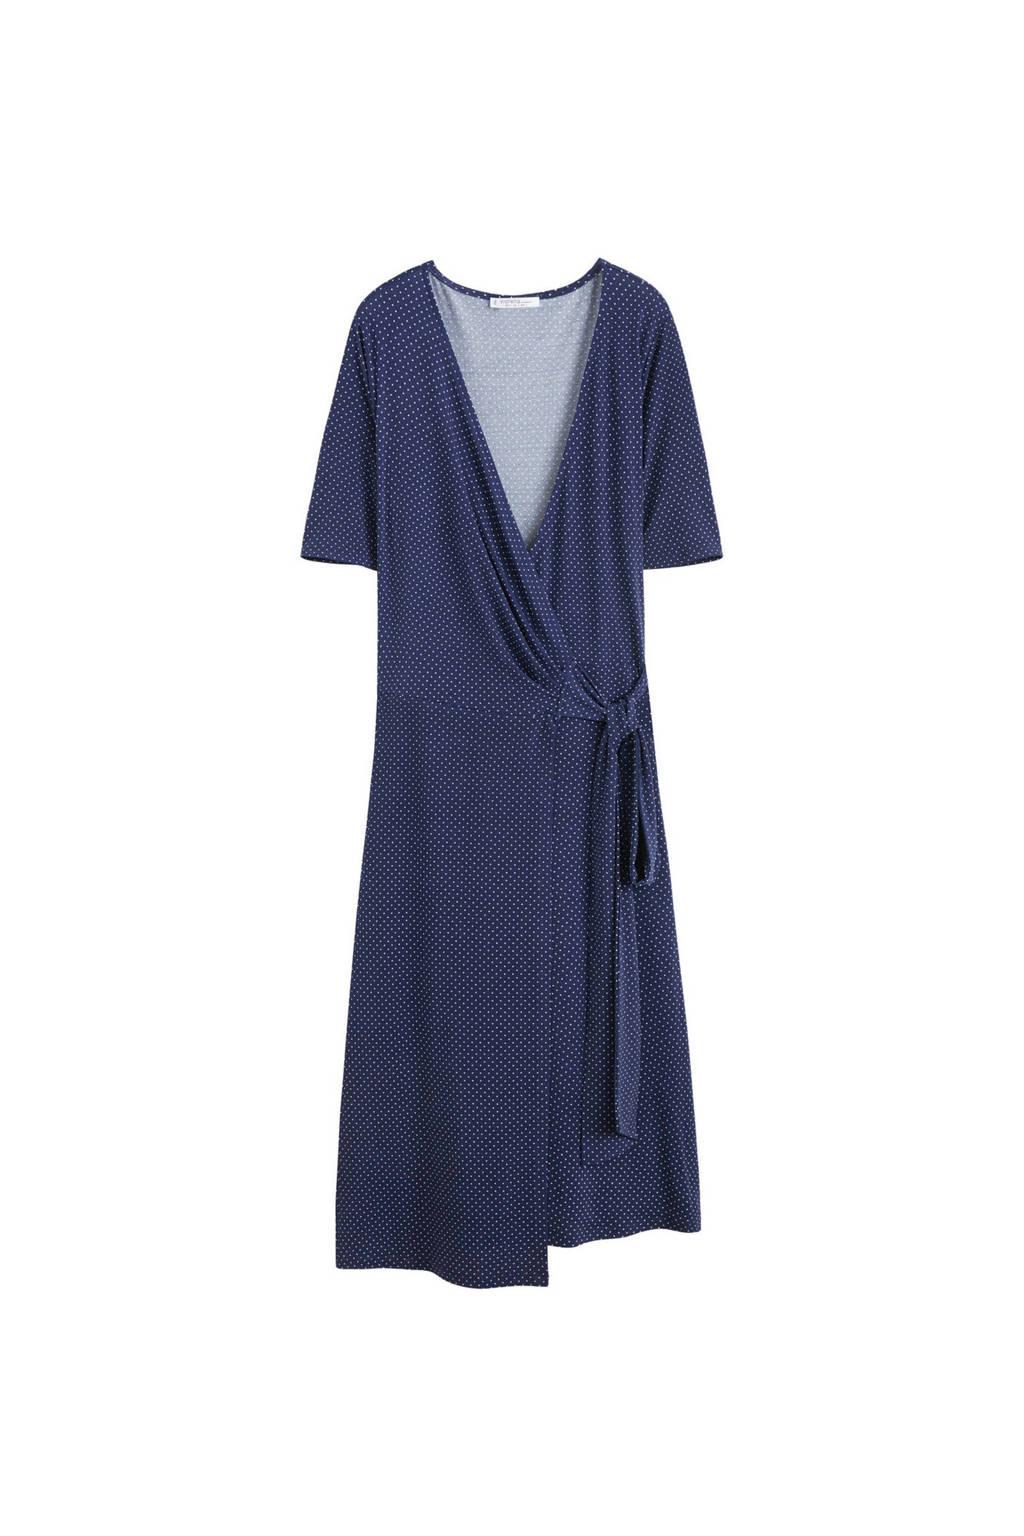 Violeta by Mango jurk met stippen donkerblauw, Donkerblauw/wit